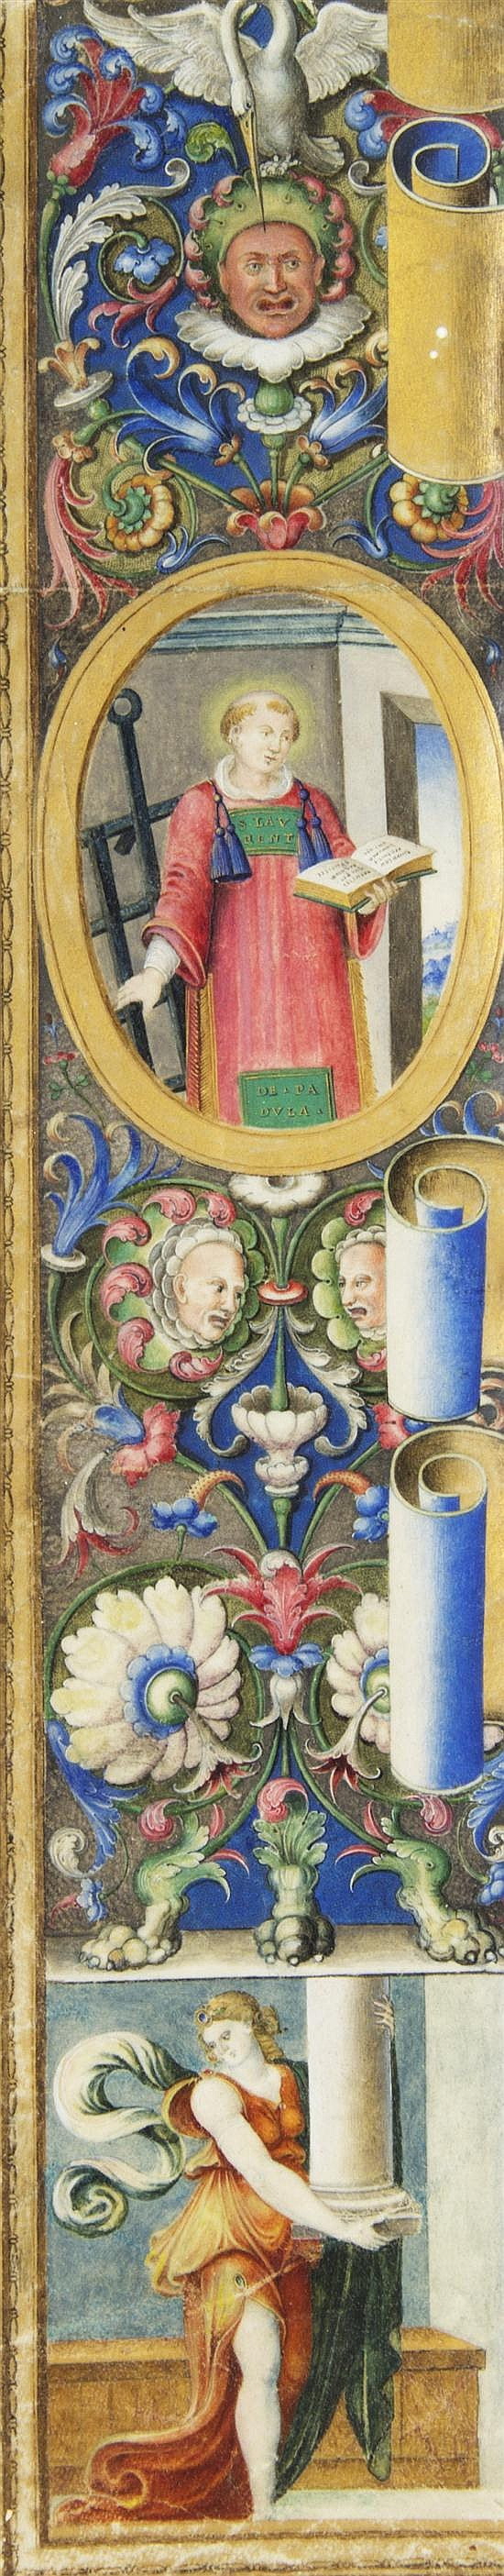 * (ILLUMINATED MINIATURE) SAINT LAWRENCE. An upright illuminated border, Italian, early 16th-century.